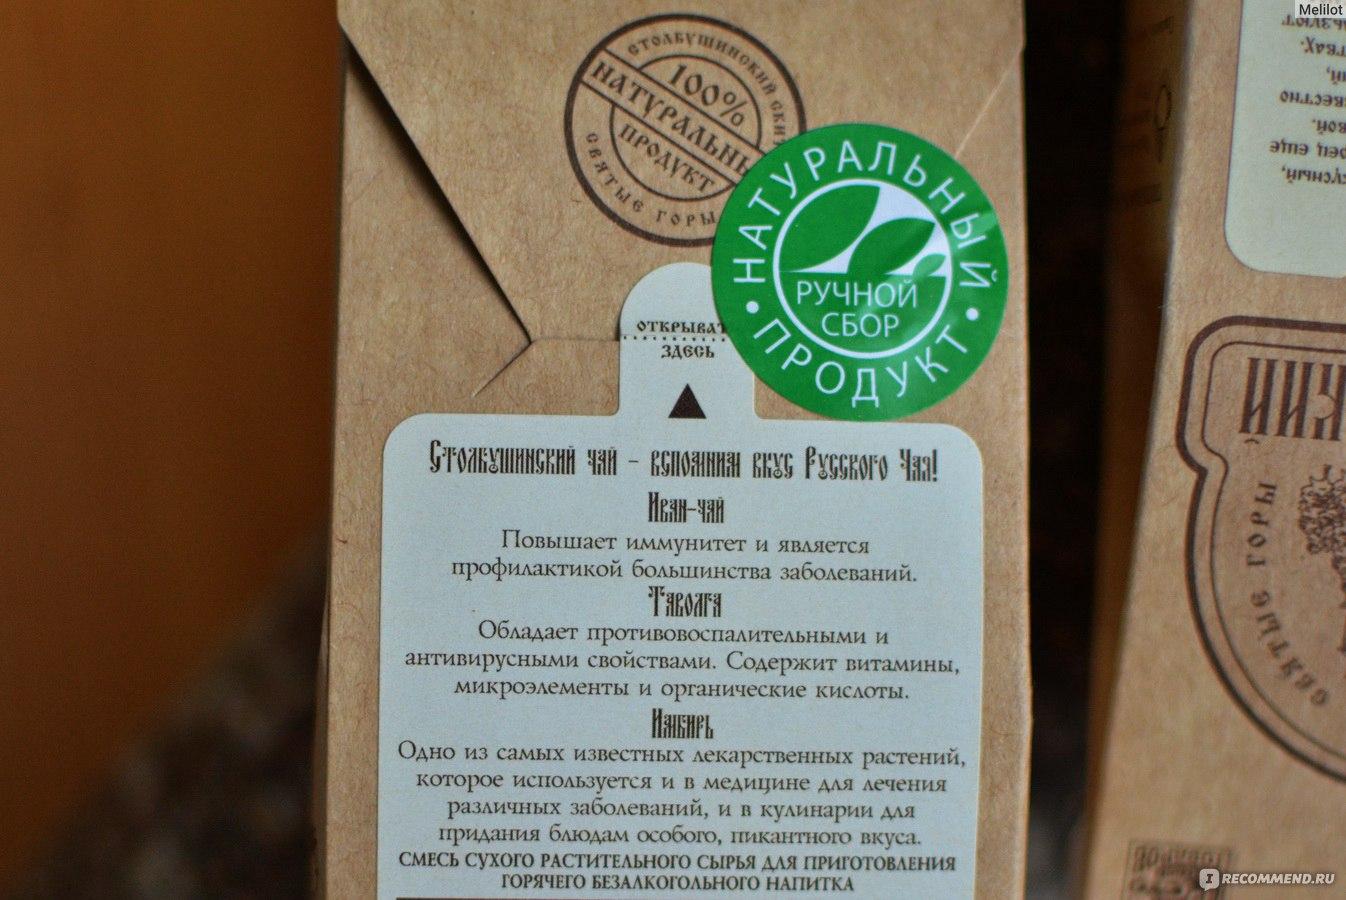 чай богатырский состав